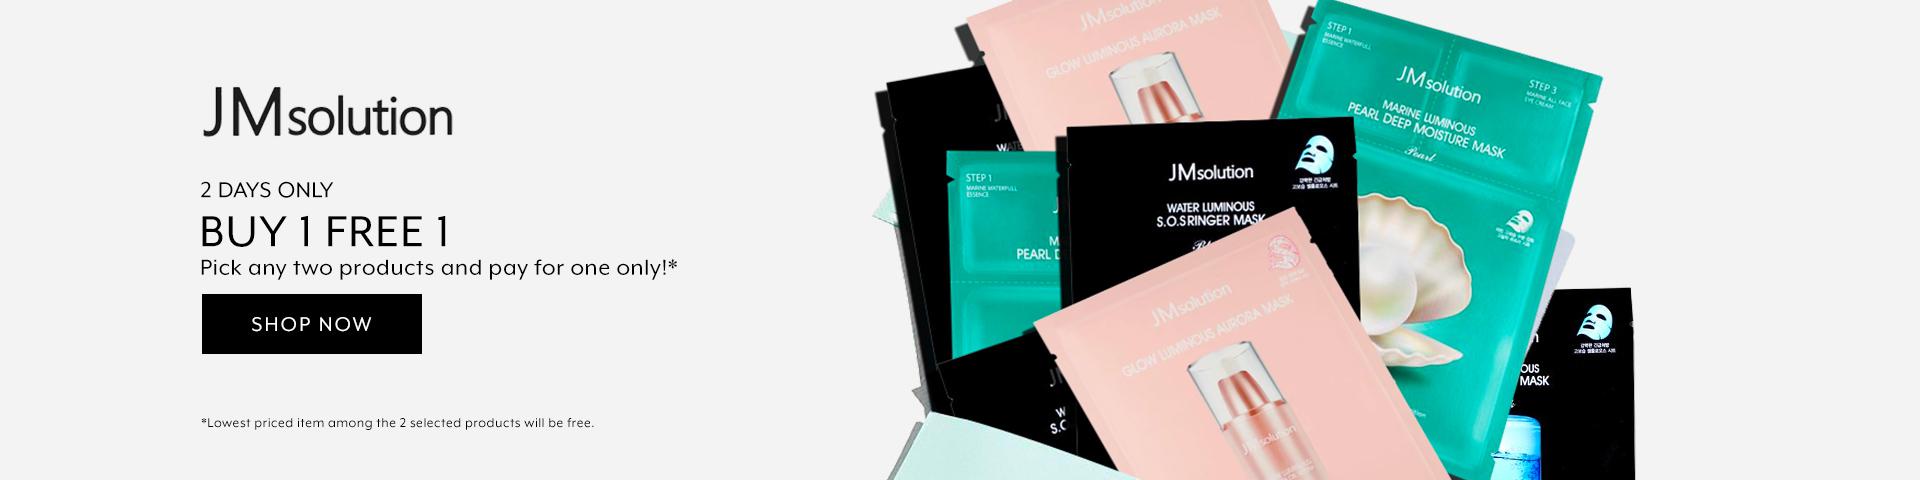 June 2019: JM Solution